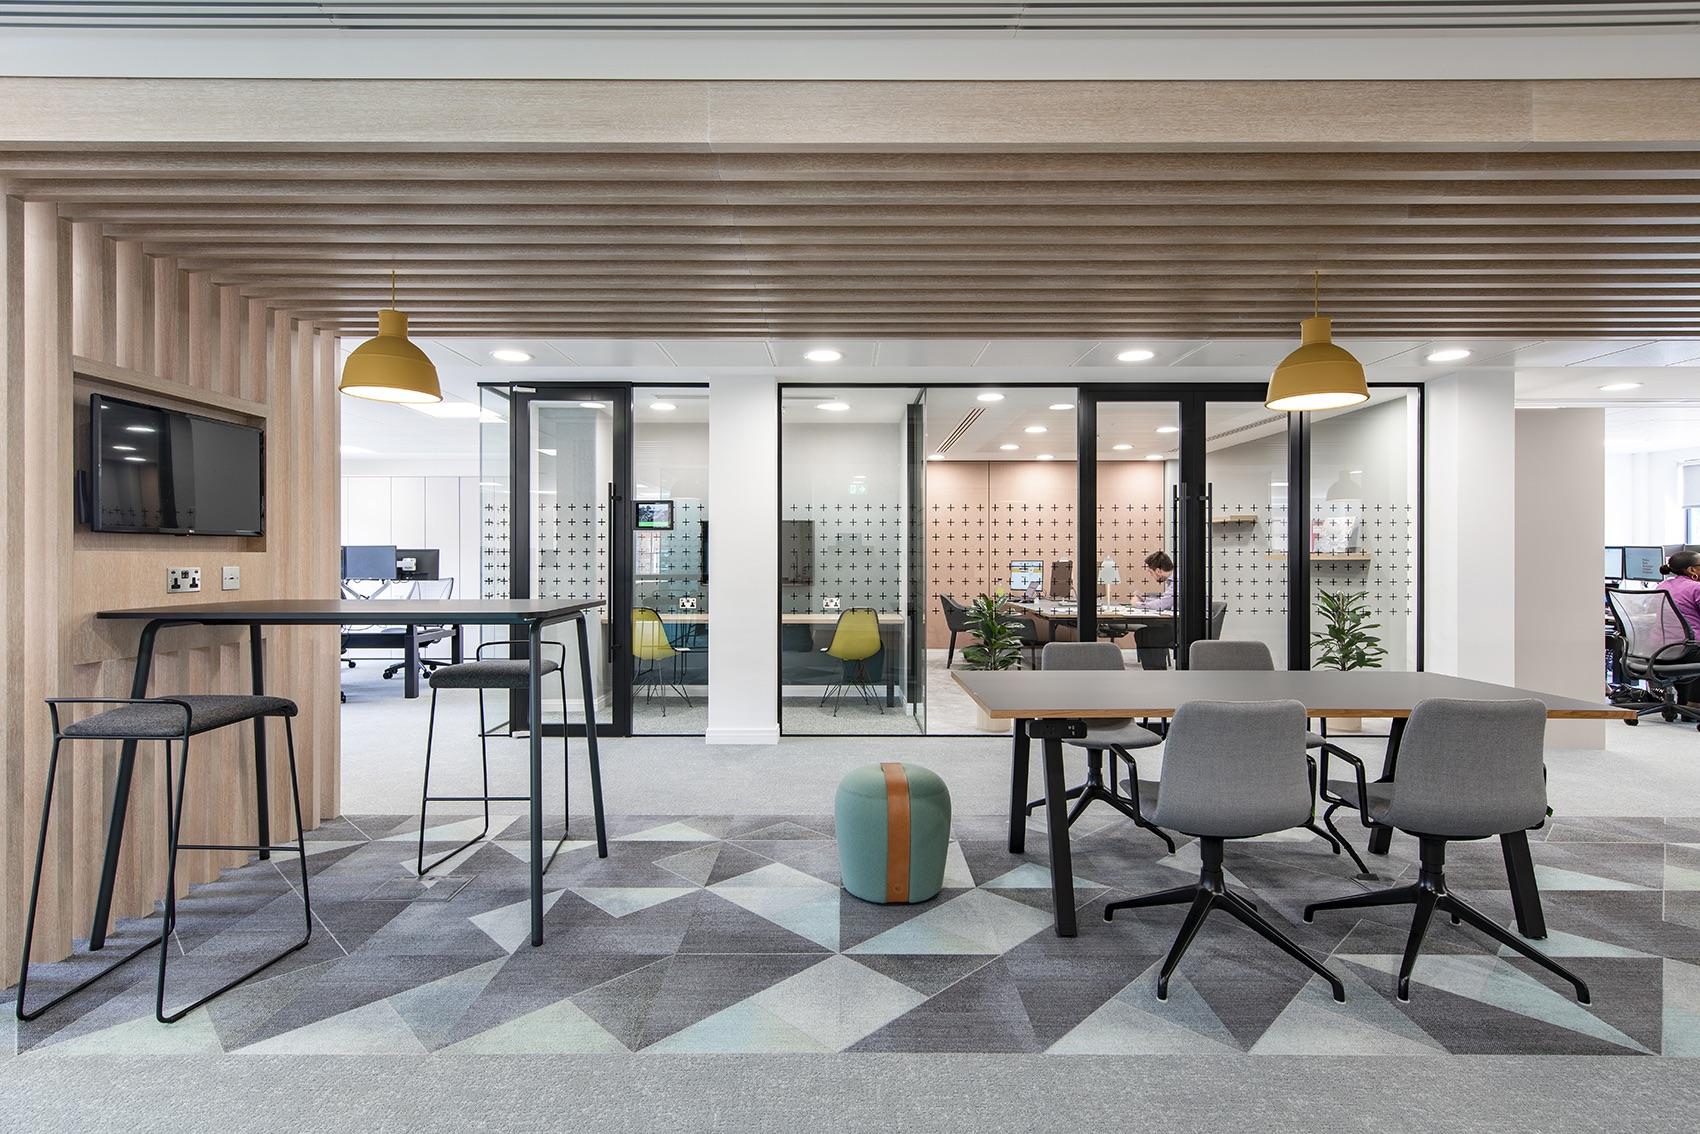 peldon-rose-new-office-london-13